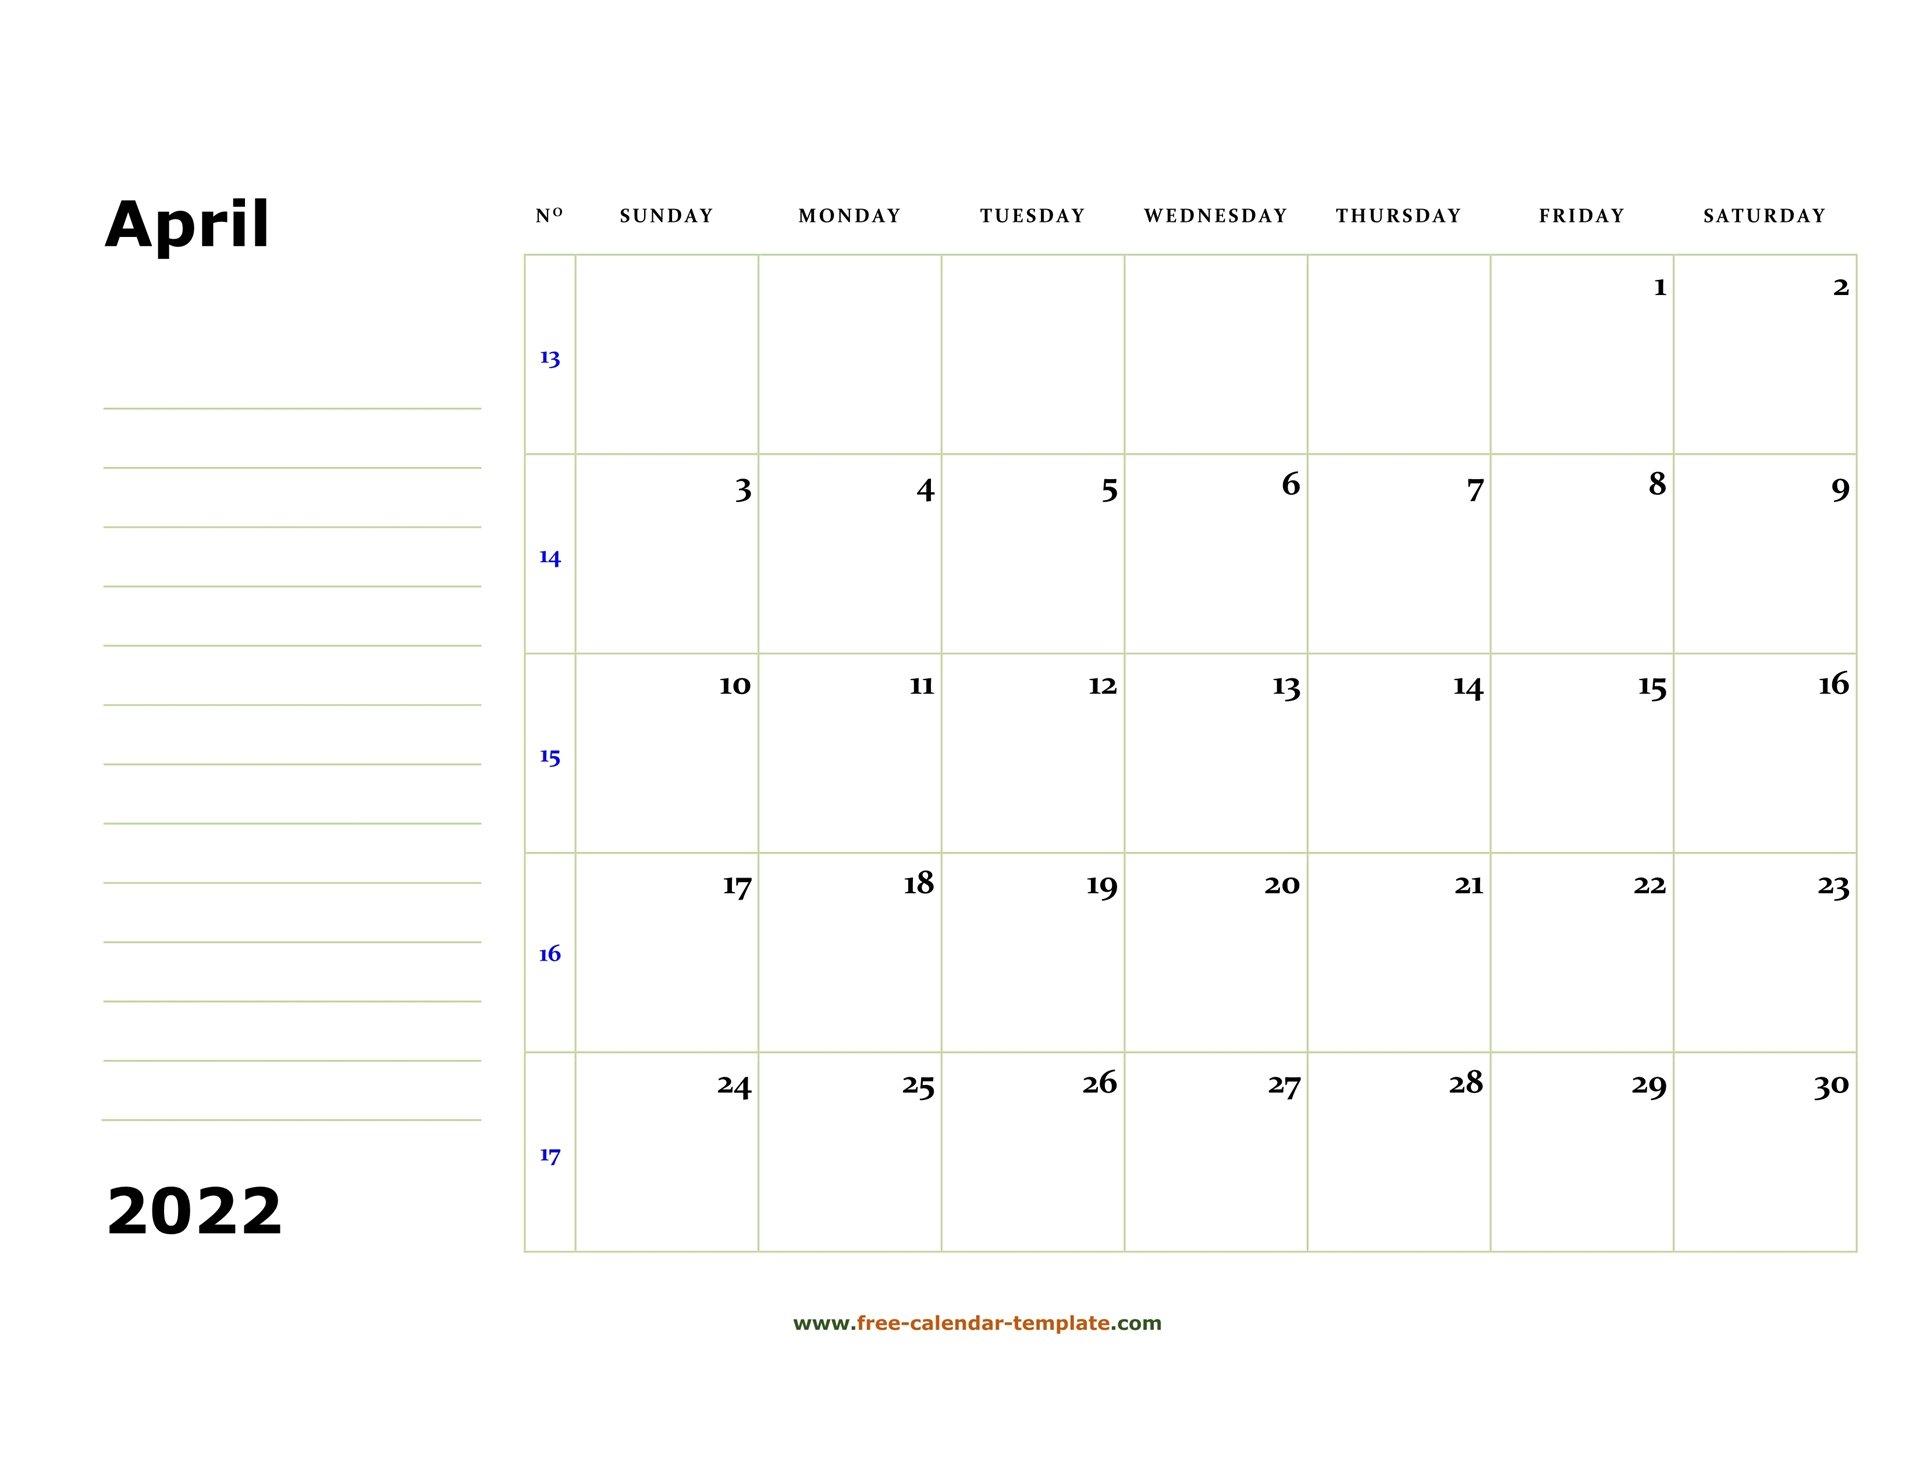 Printable April 2022 Calendar (Box And Lines For Notes for April Calendar 2022 Free Printable